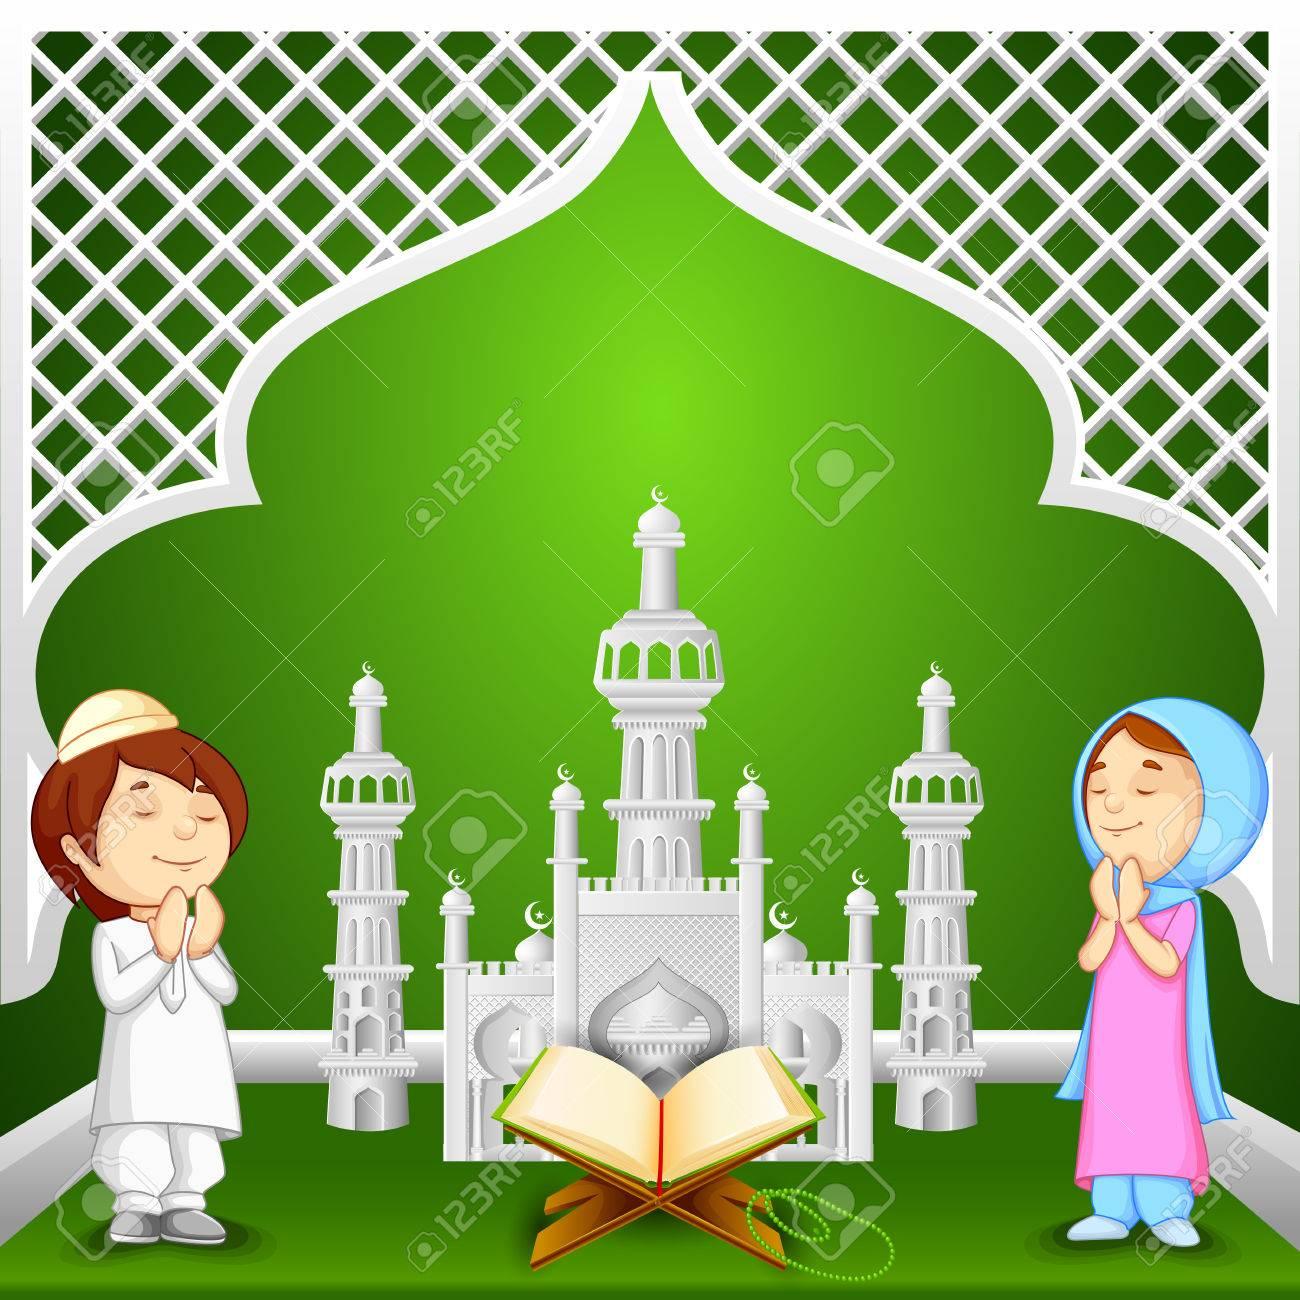 Amazing Child Eid Al-Fitr Feast - 42064520-vector-illustration-of-muslim-kids-offering-namaaz-for-eid-ul-fitr-feast-of-breaking-the-fast-  Best Photo Reference_653317 .jpg